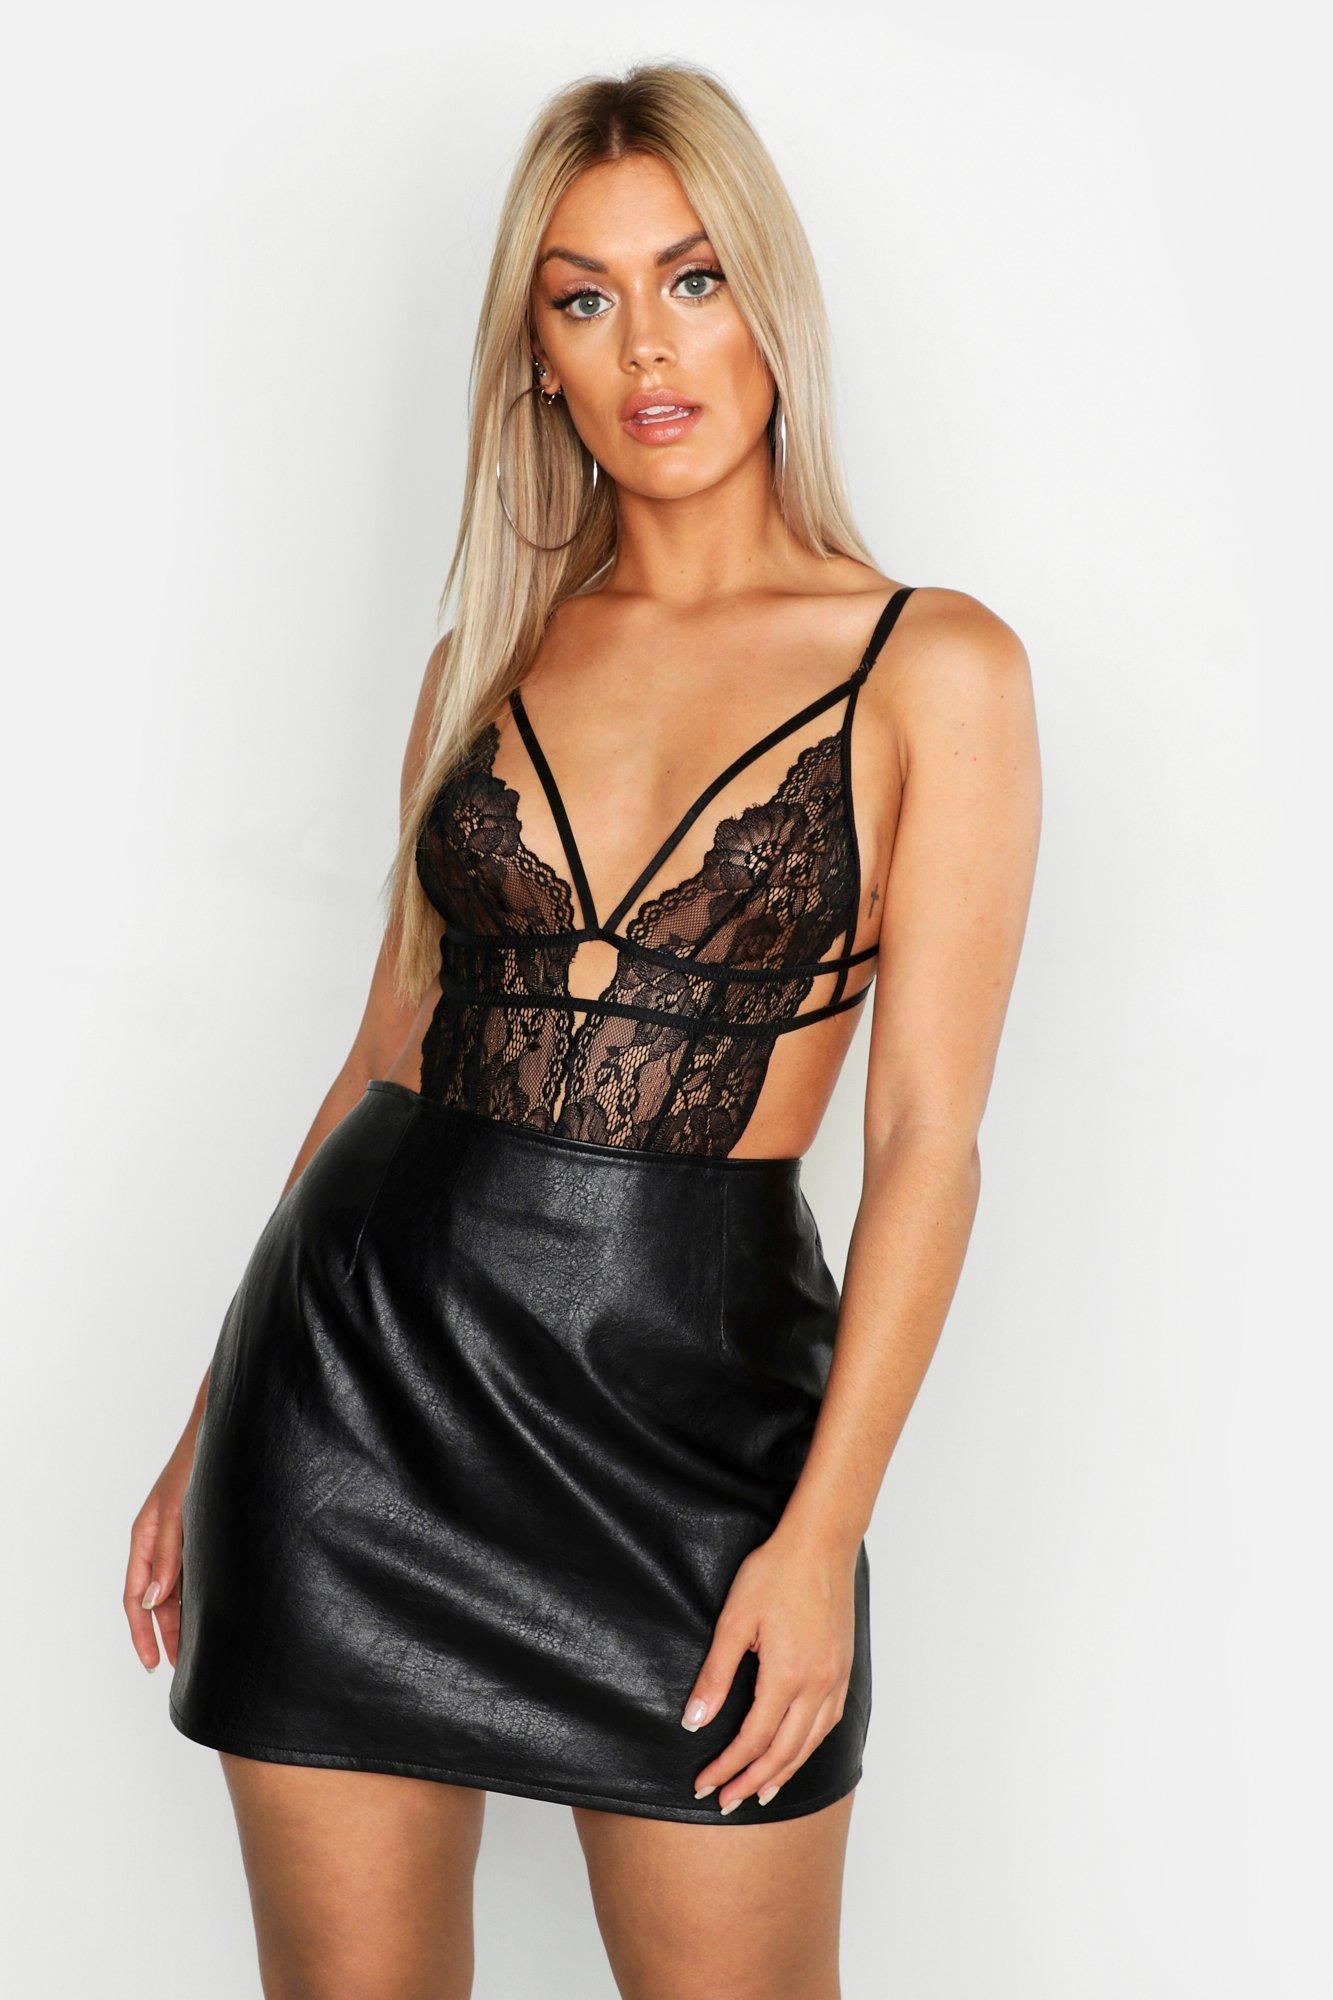 486d56481ec0 Boohoo Plus Lace Strappy Plunge Bodysuit in Black - Lyst